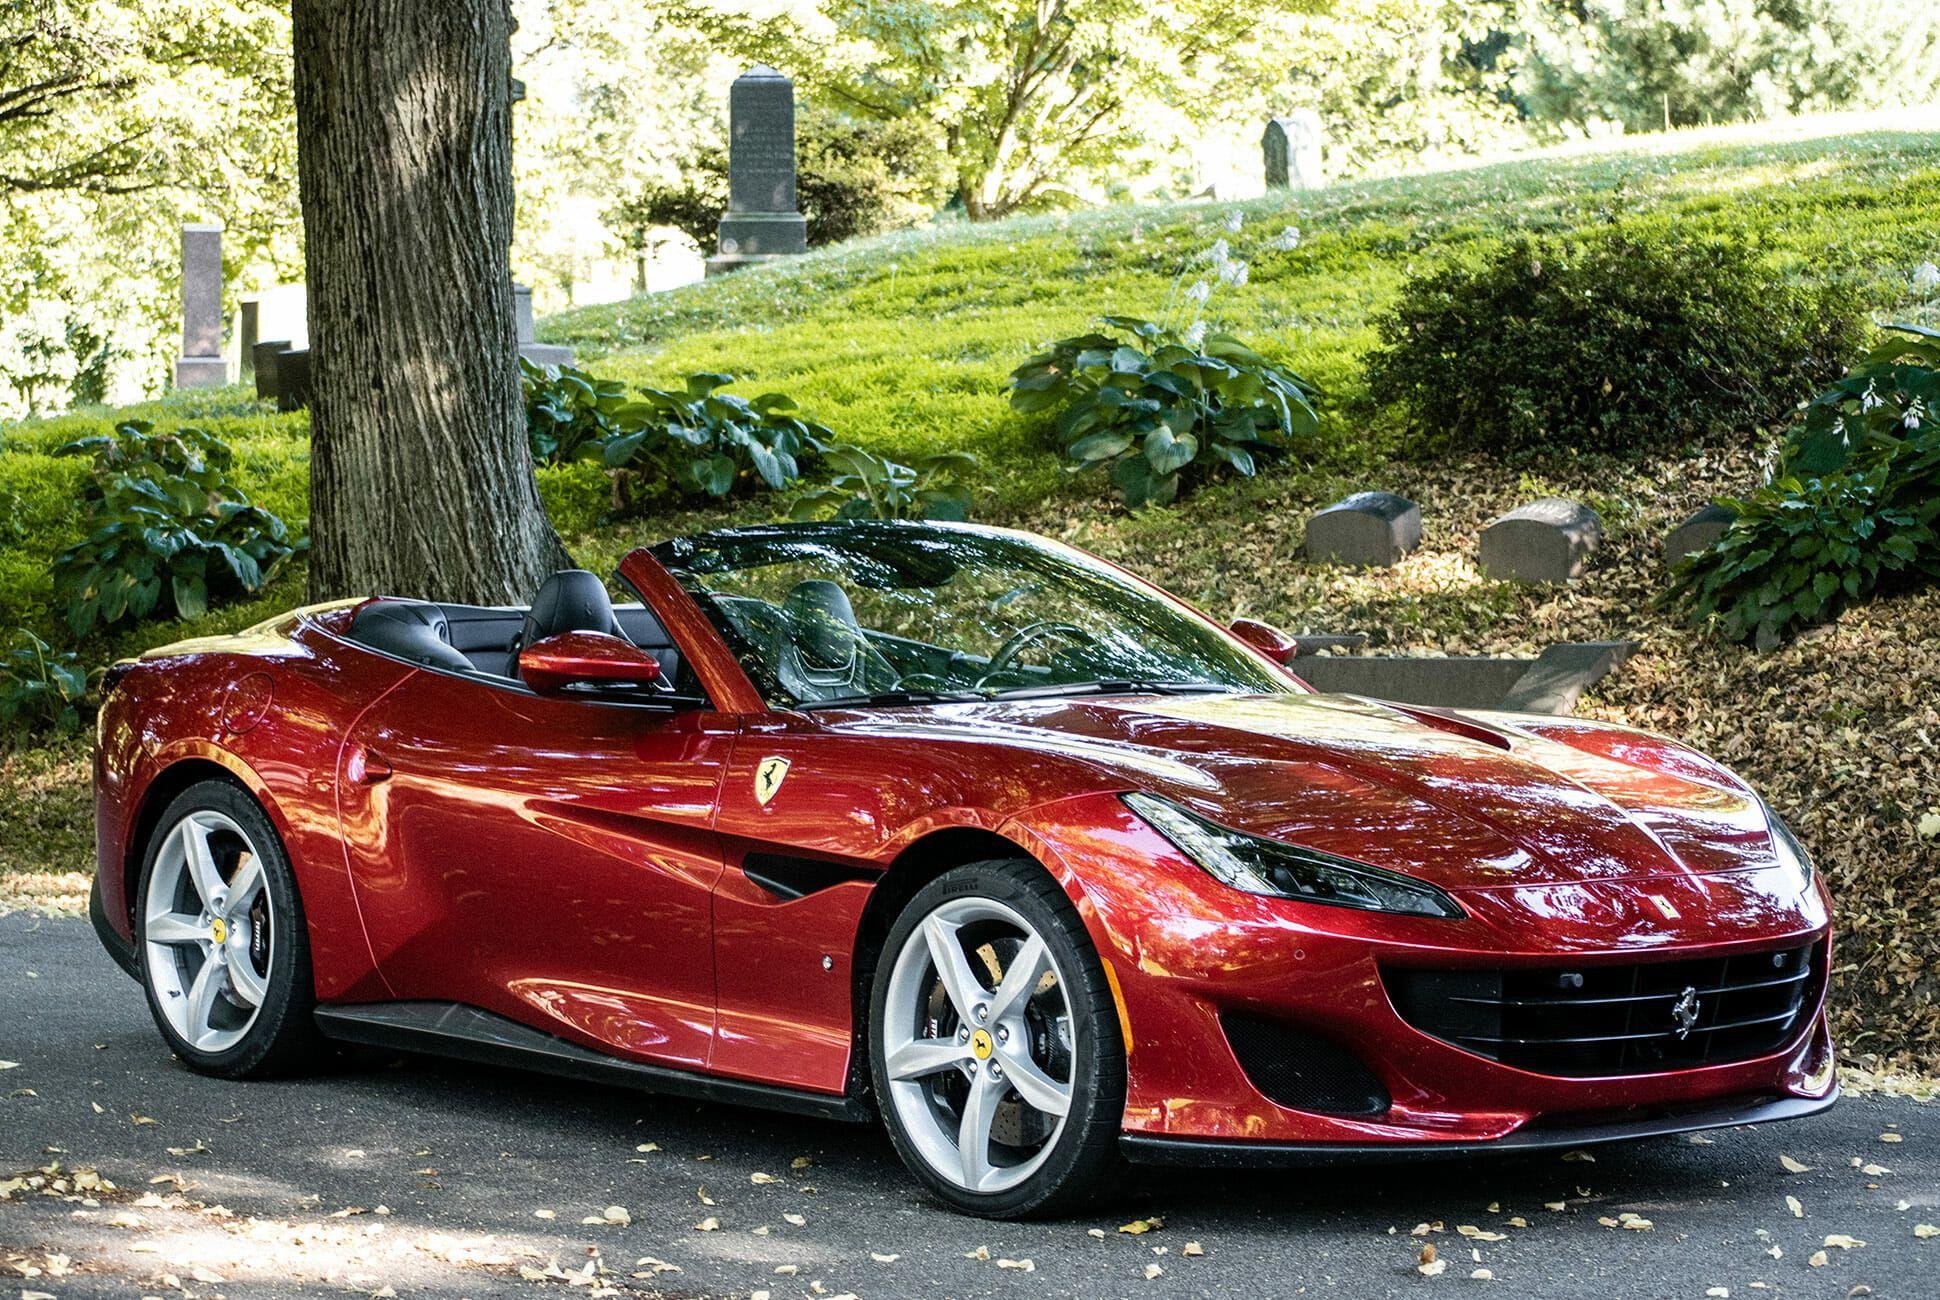 Ferrari-Portofino-Review-gear-patrol-slide-1